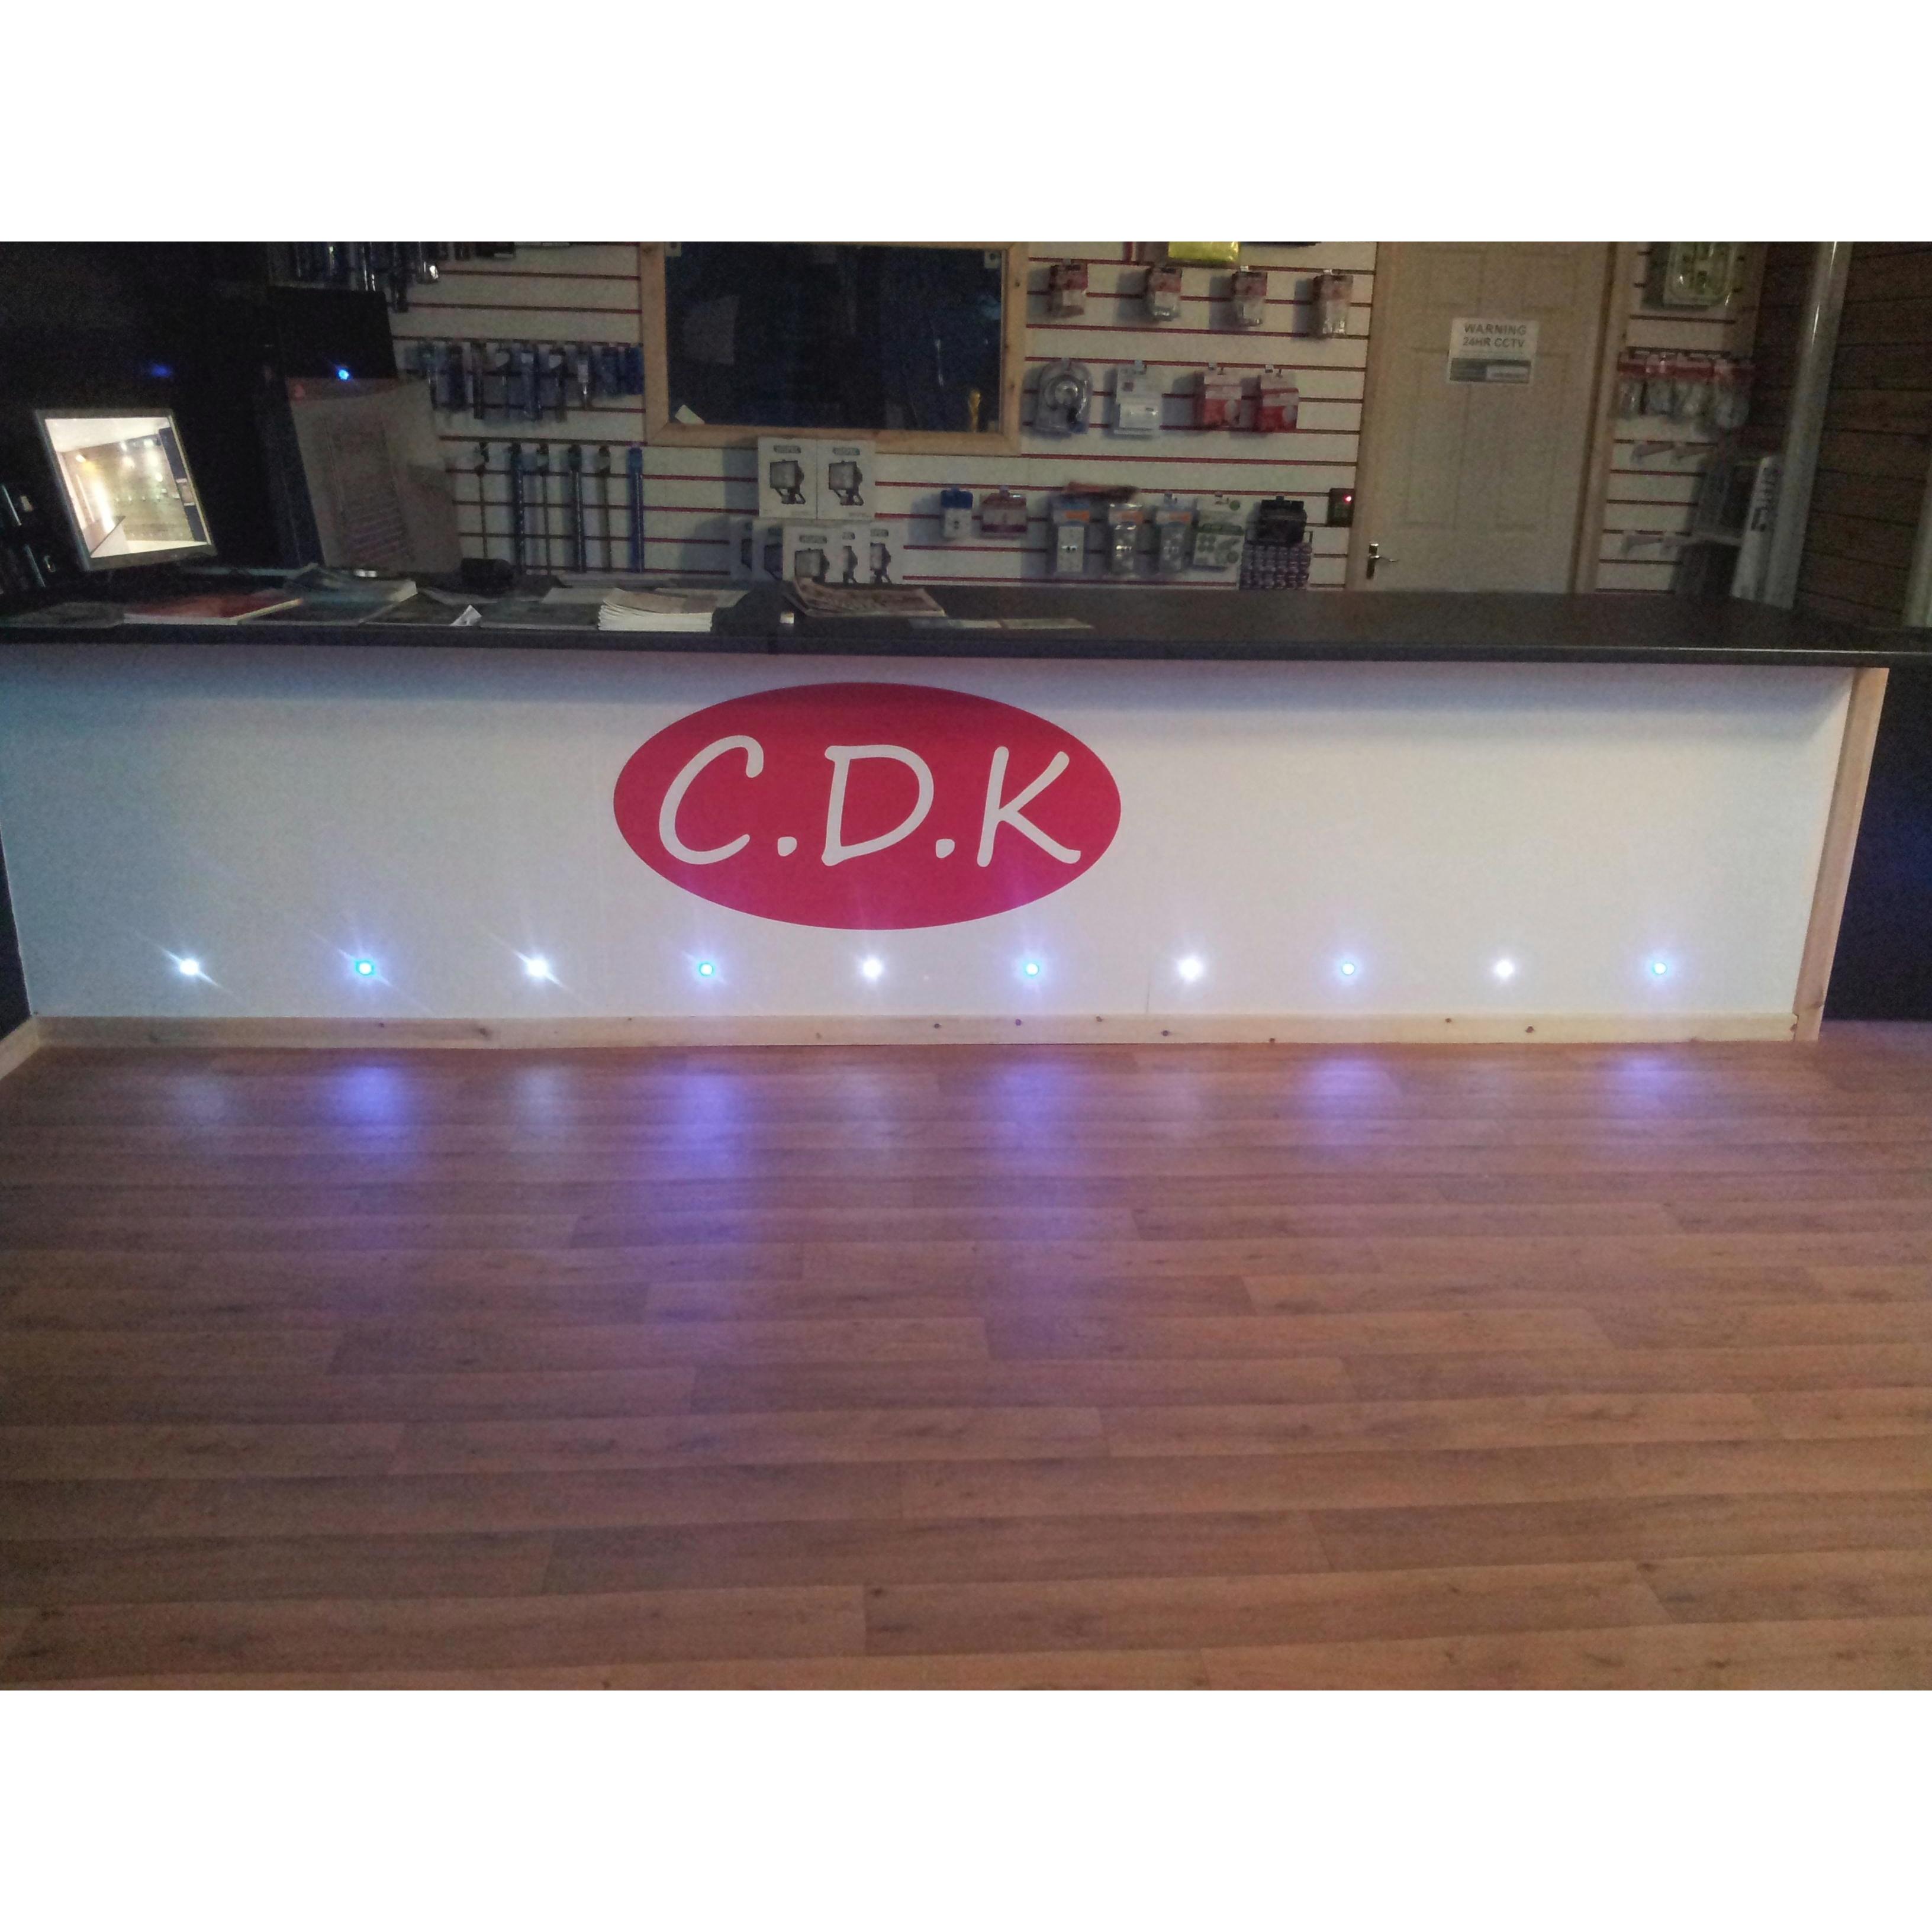 Cdk Electrical Supplies Ltd